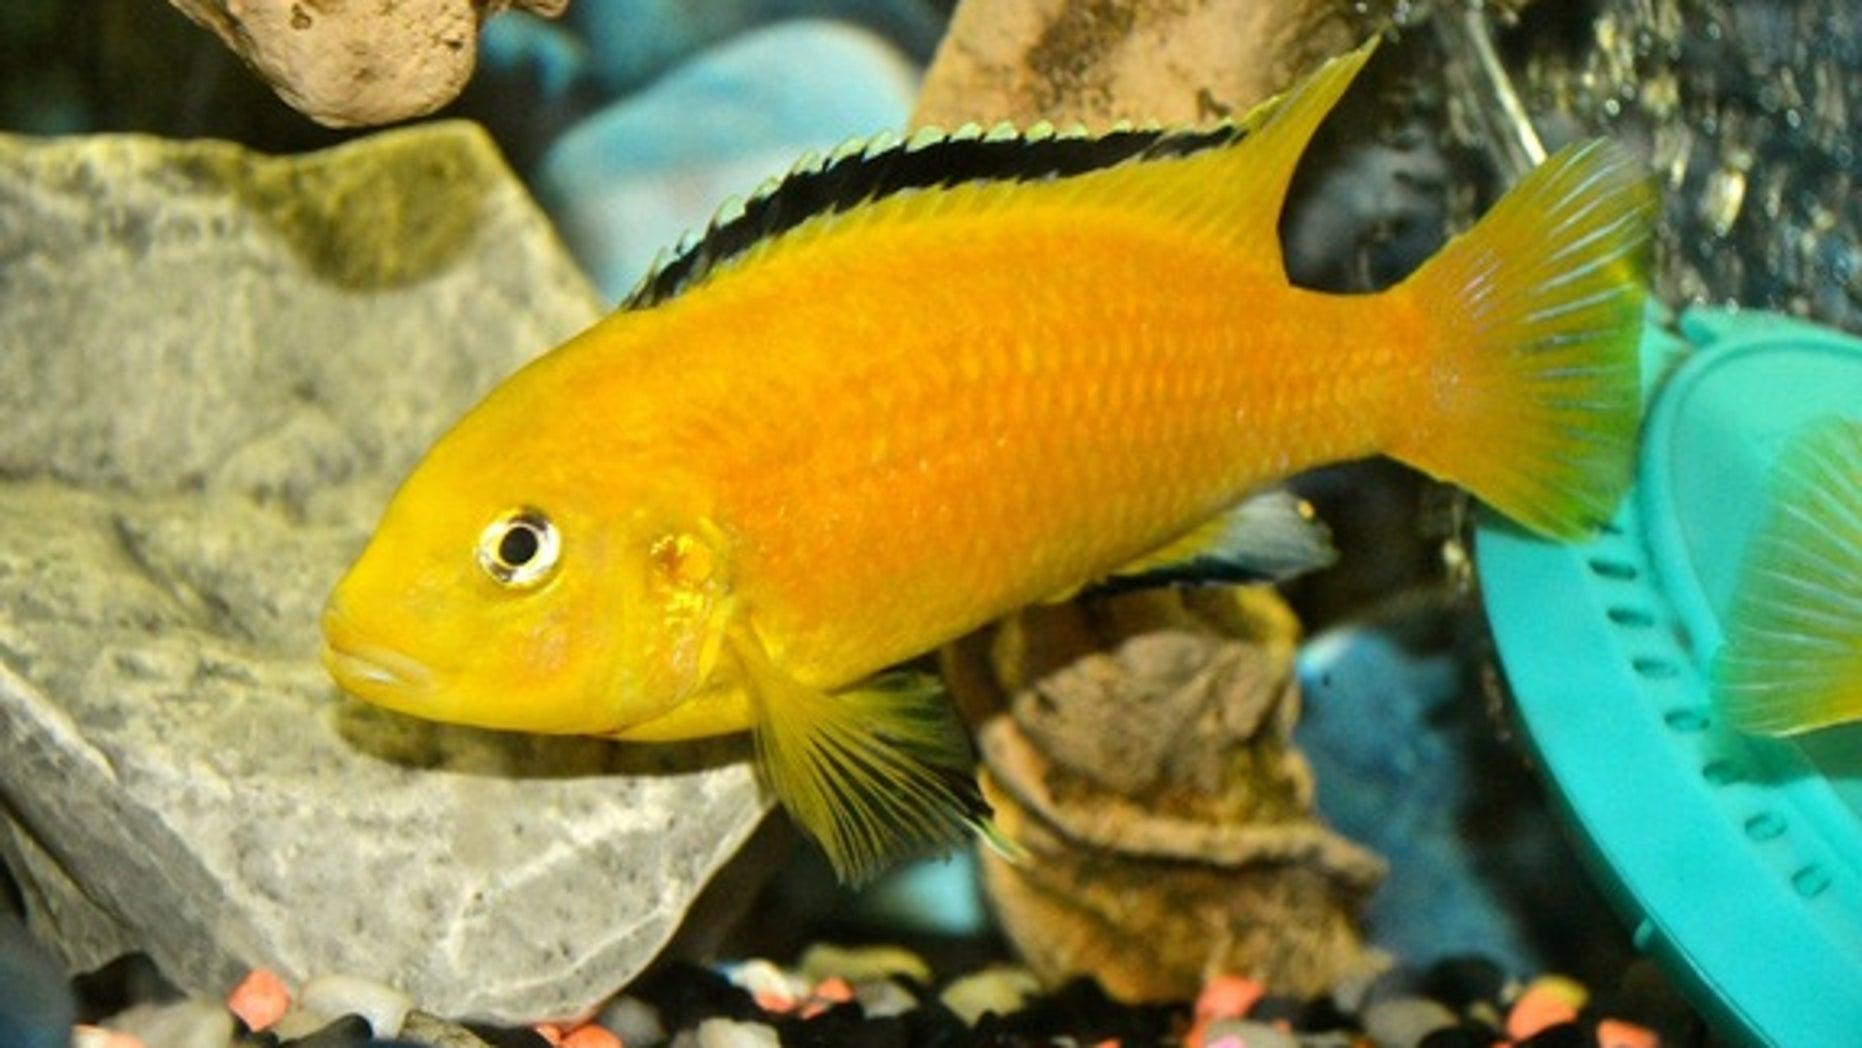 An African cichlid <i>(Labidochromis caeruleus)</i>